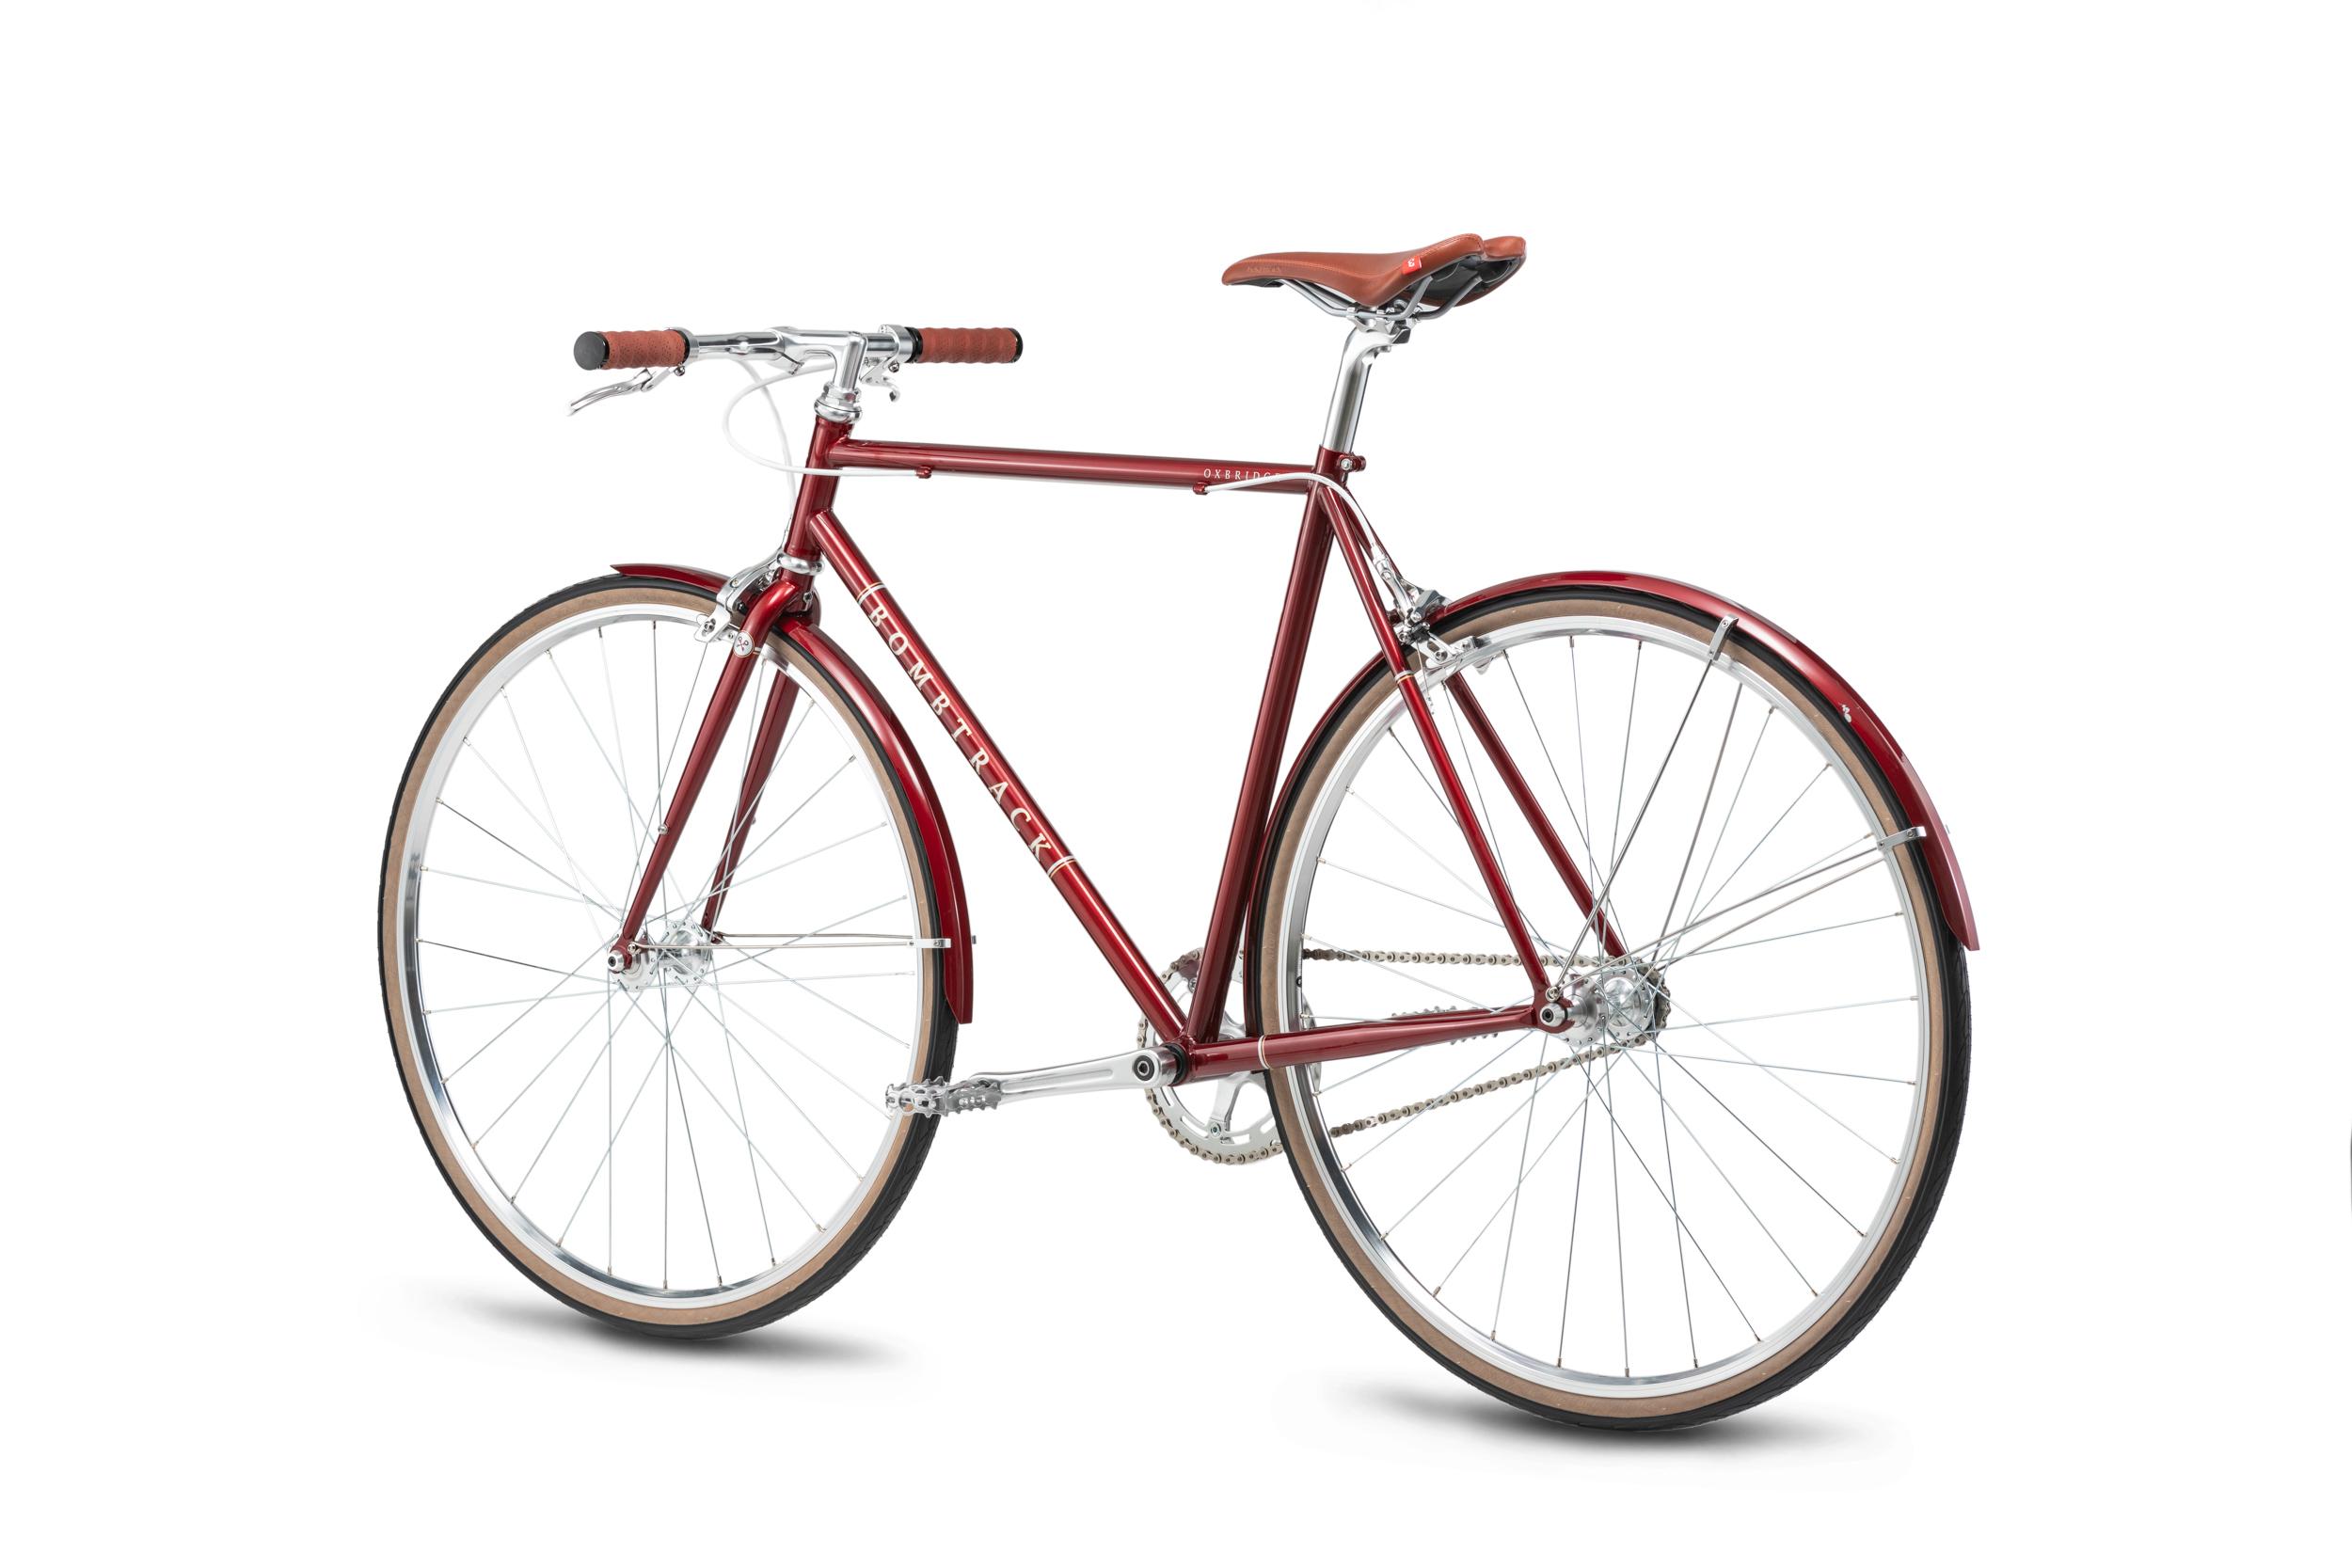 Singlespeed-Bike kaufen auf Ricardo